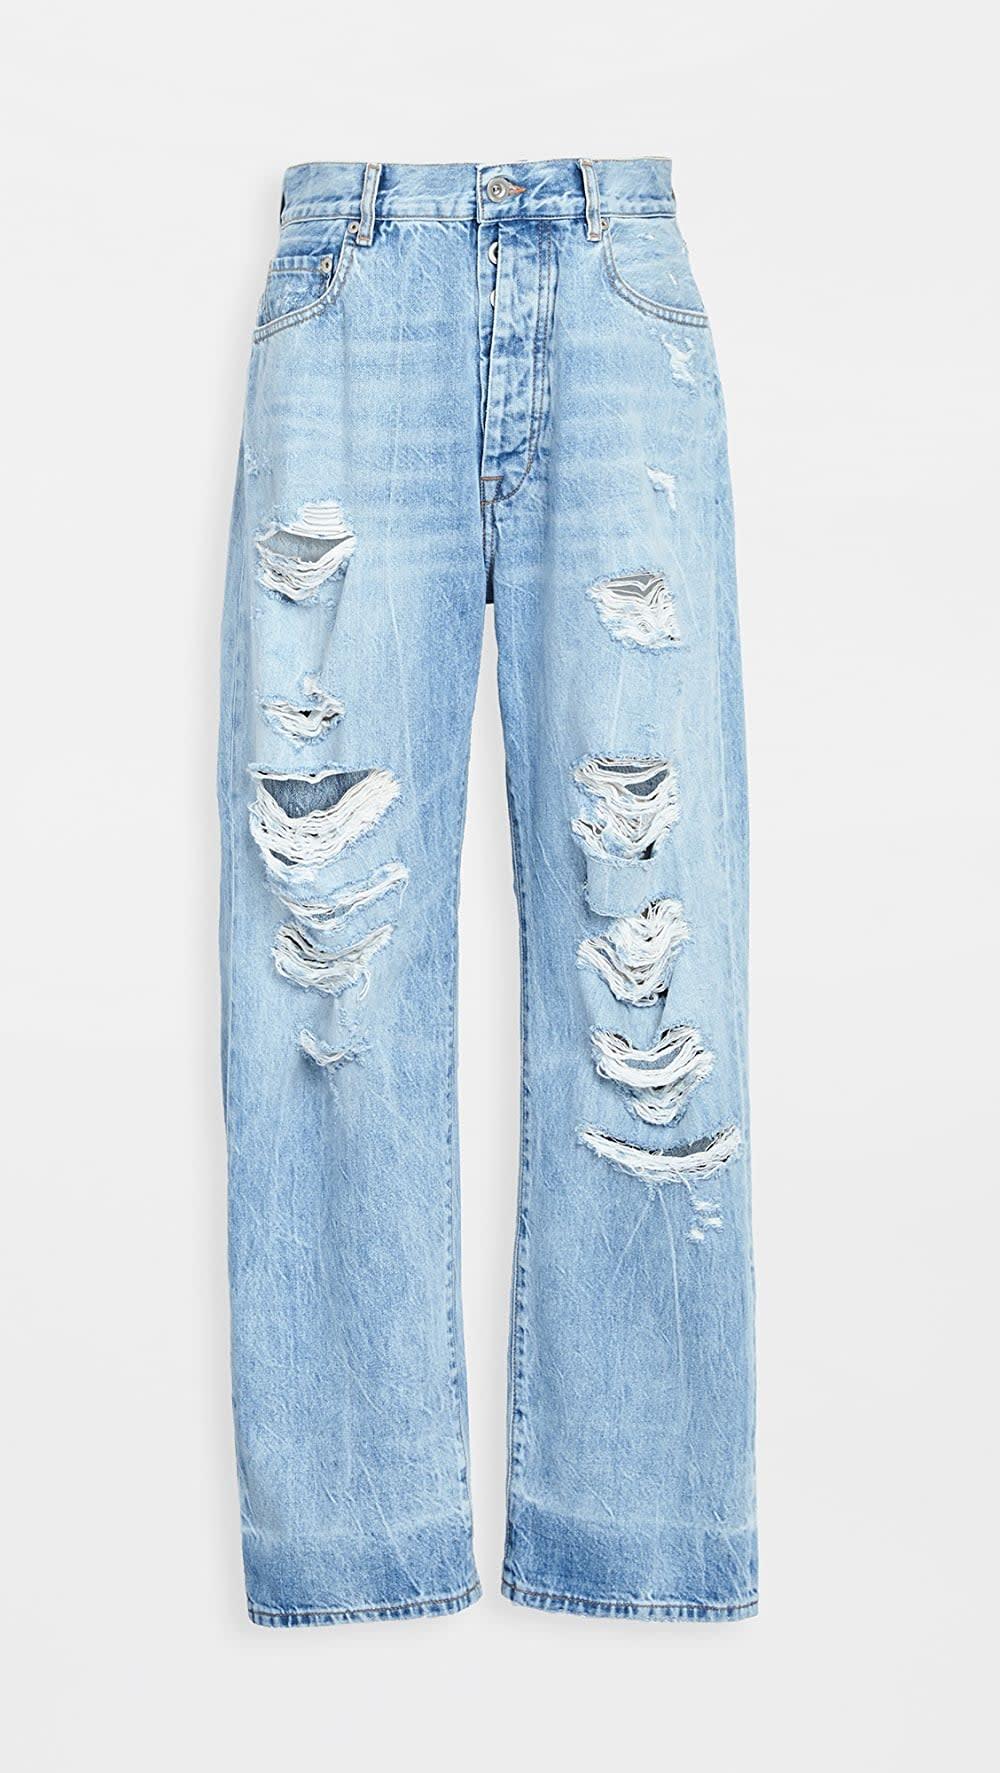 <p><span>Unravel Project Distressed Baggy Boyfriend Jeans</span> ($459, originally $655)</p>